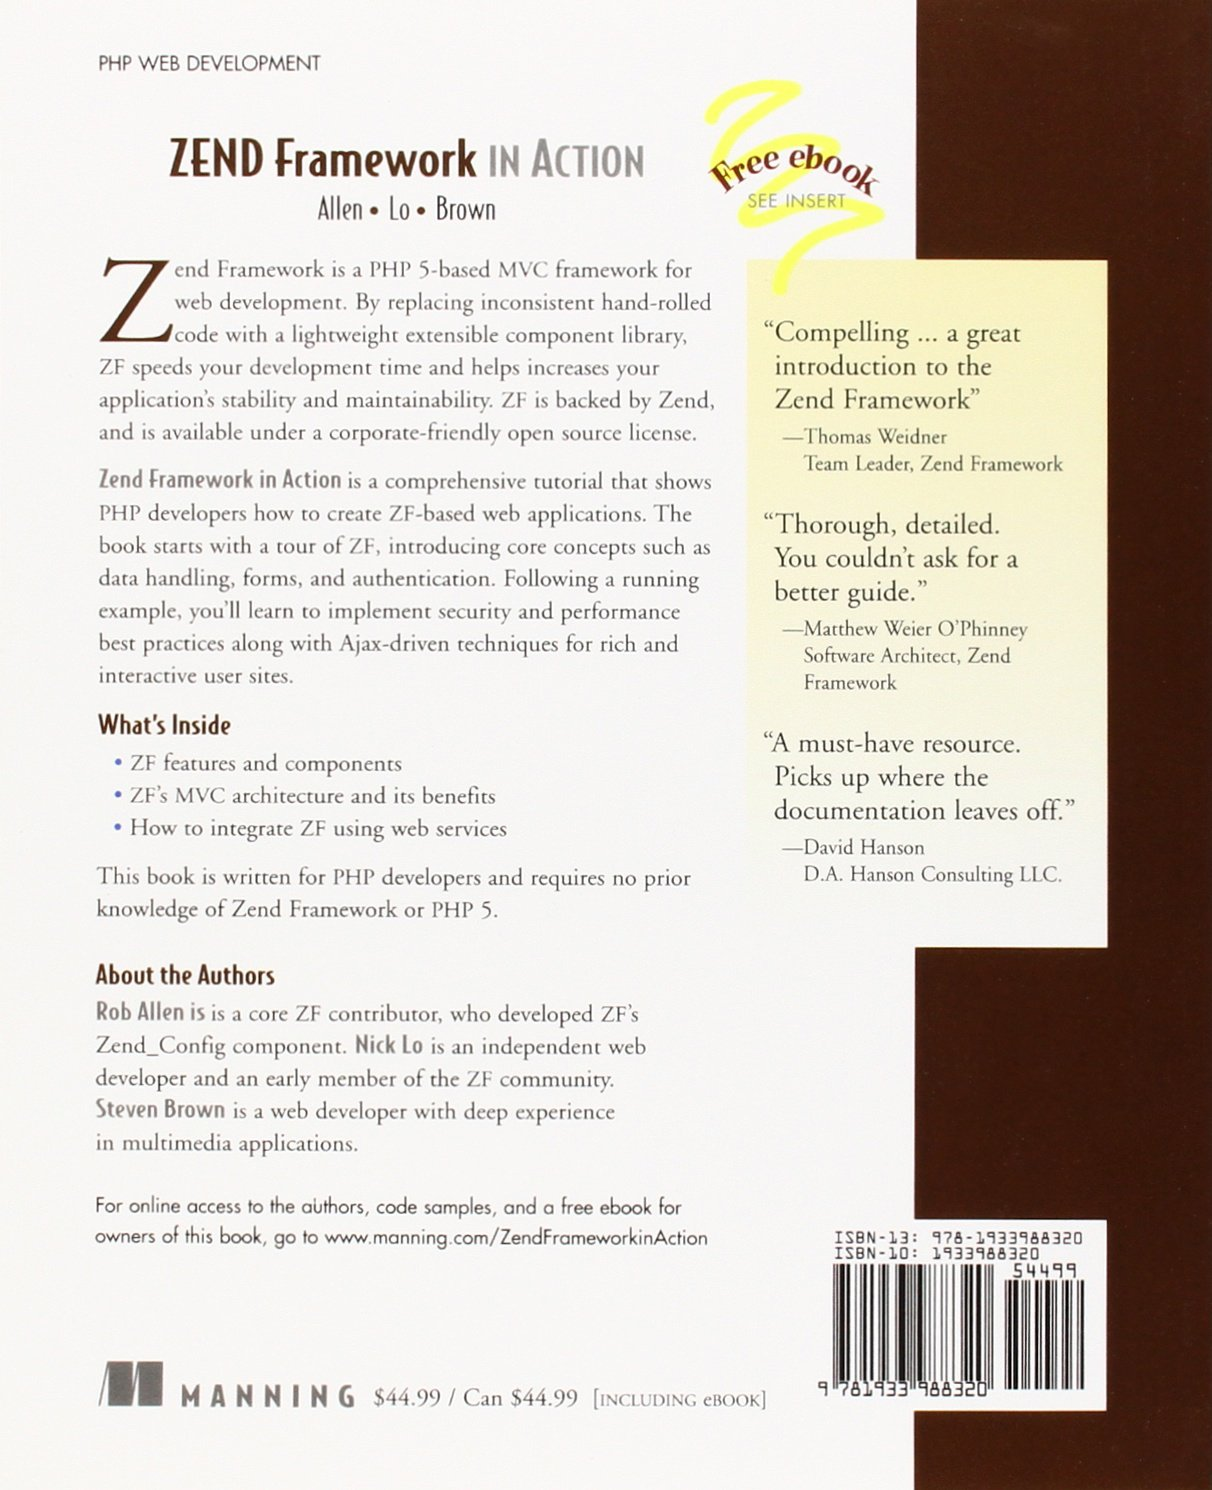 Zend Framework in Action: Amazon co uk: Rob Allen, Nick Lo